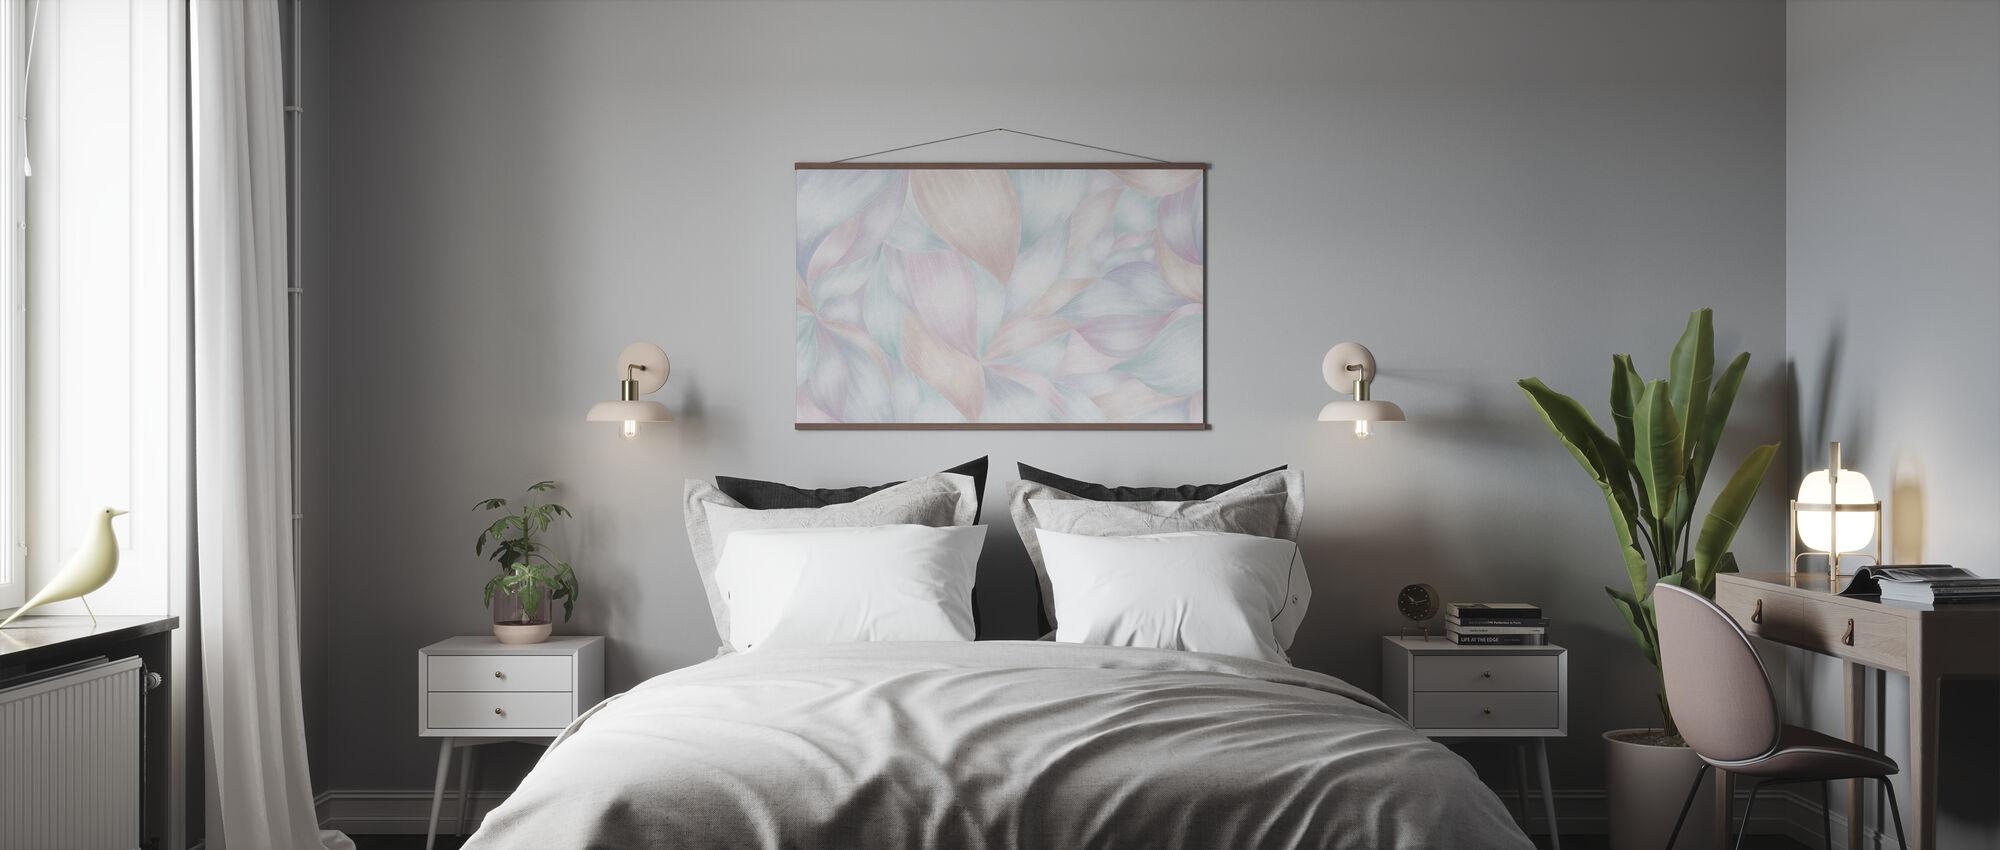 Vloeiende vormen - Poster - Slaapkamer